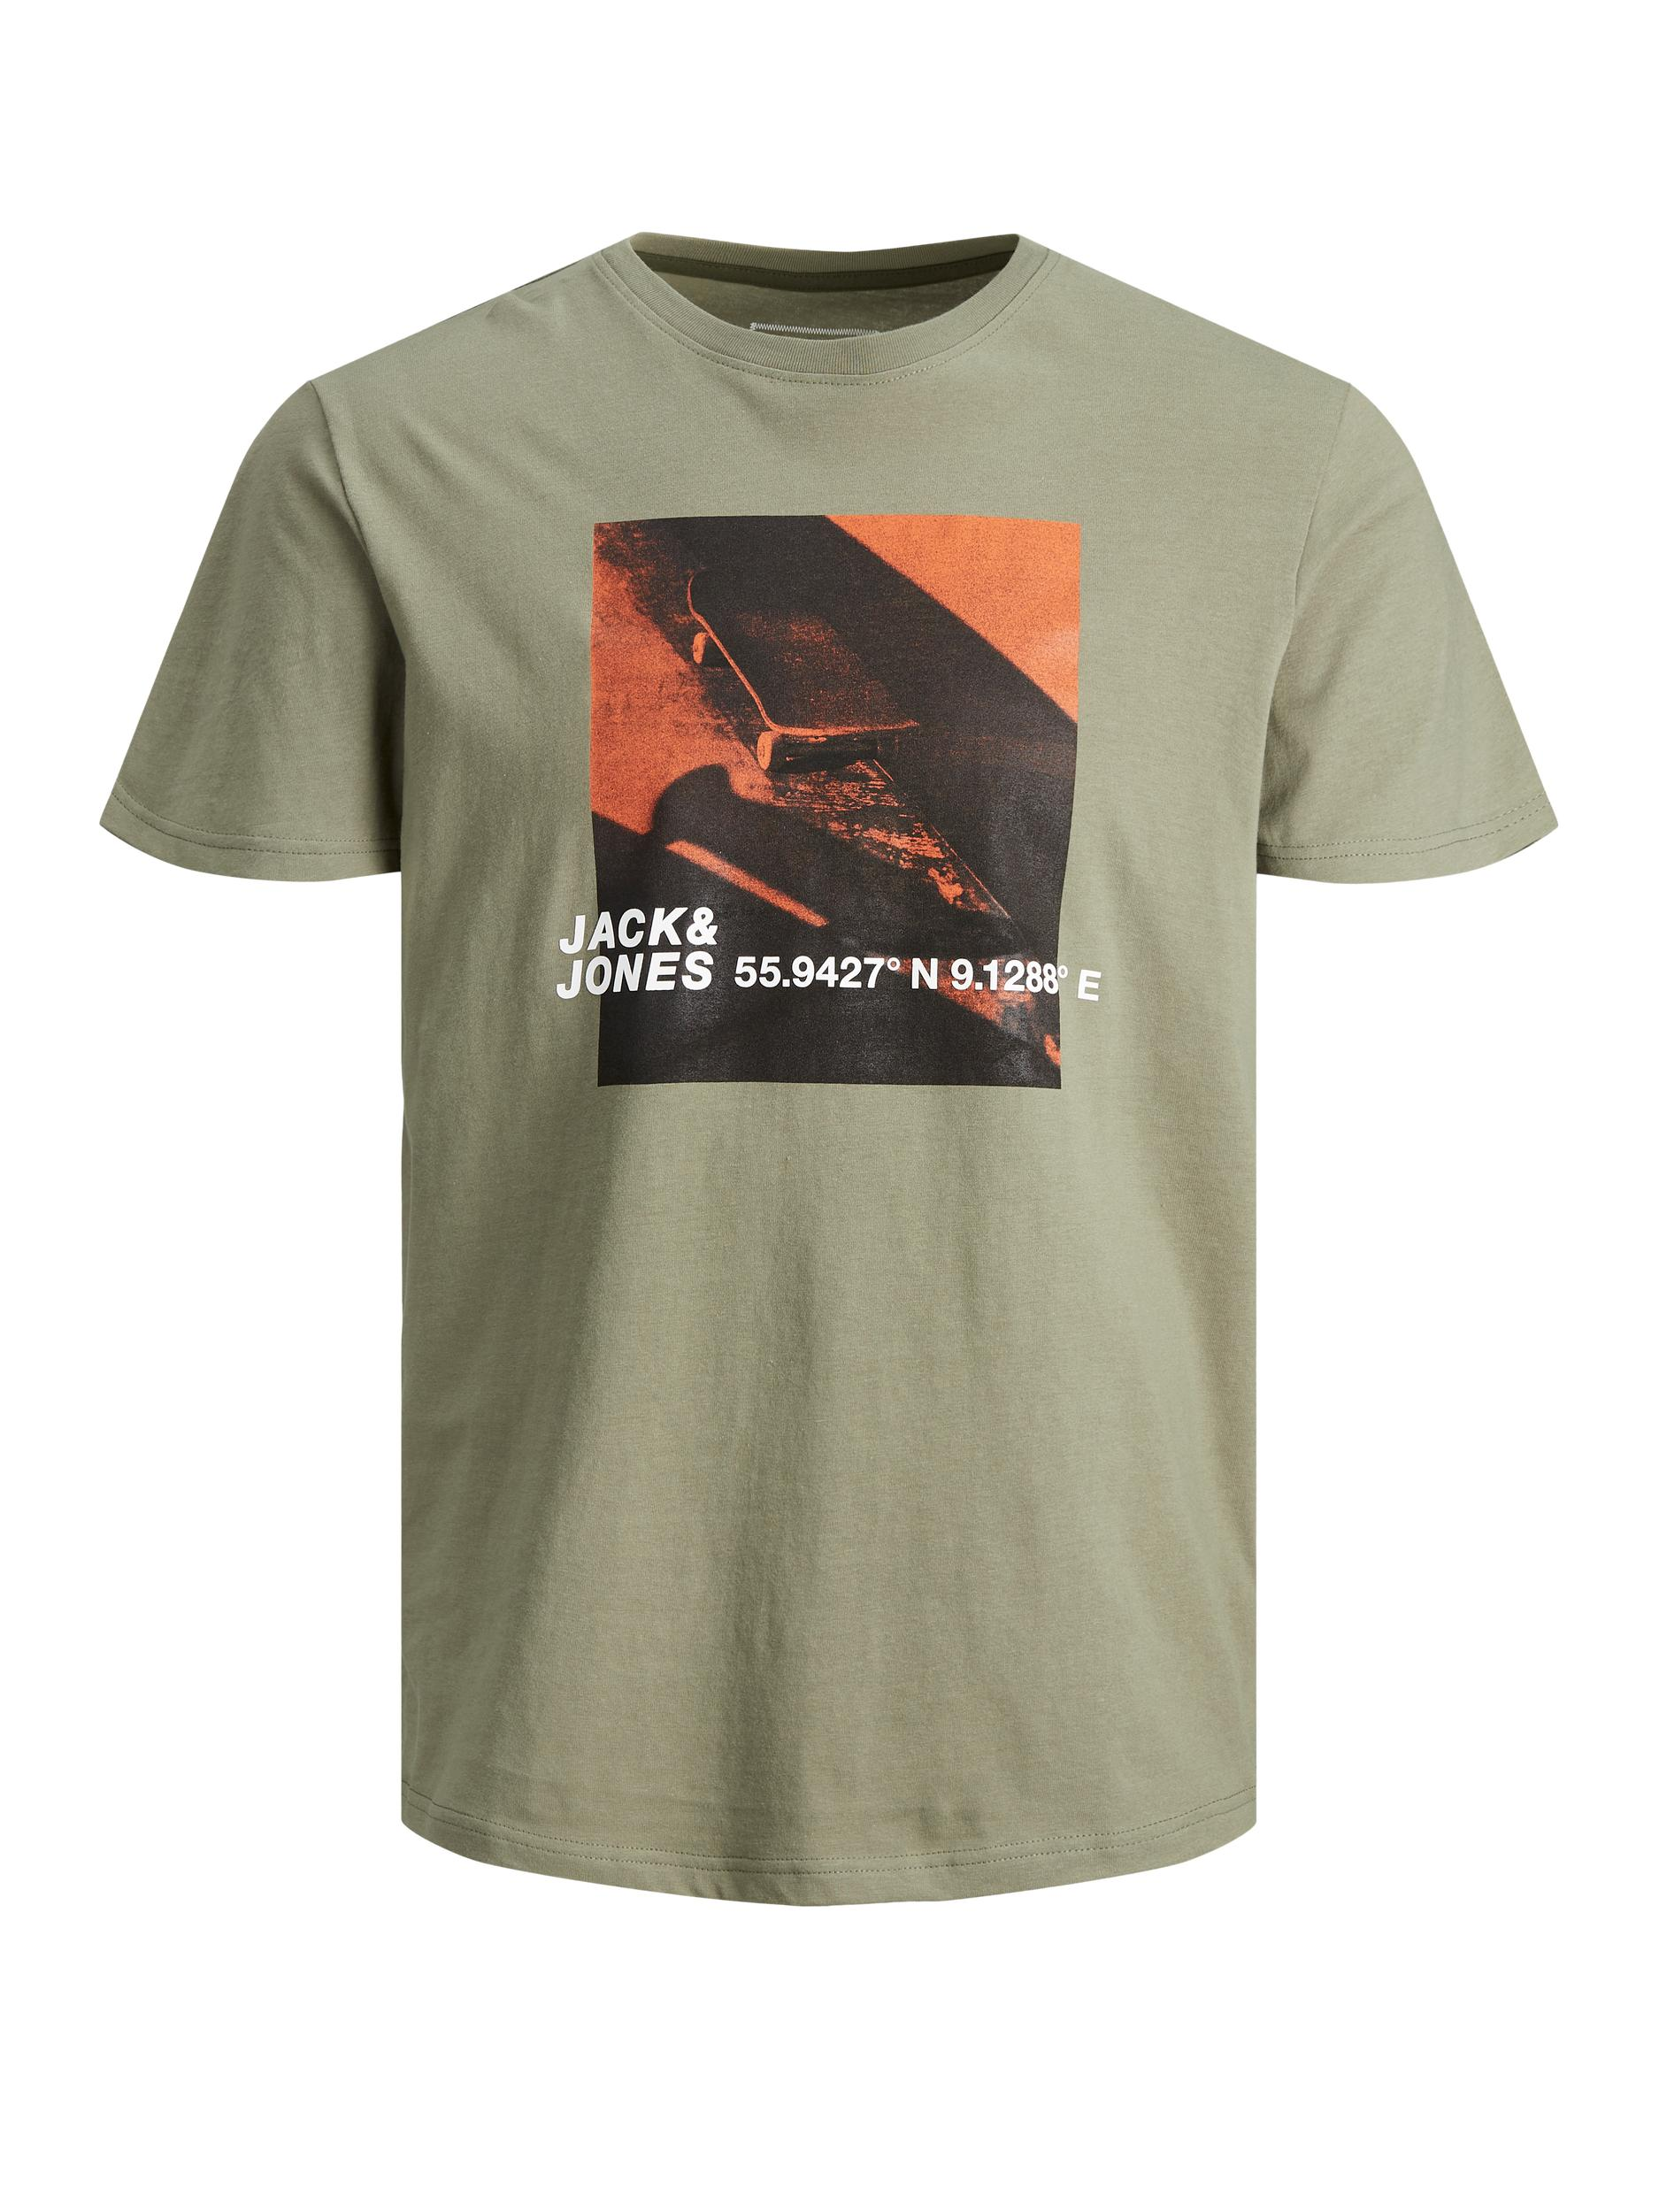 Cojump Tee Crew neck plus JACK&JONES | T-shirt | 12186571DEEP LICHEN GREEN